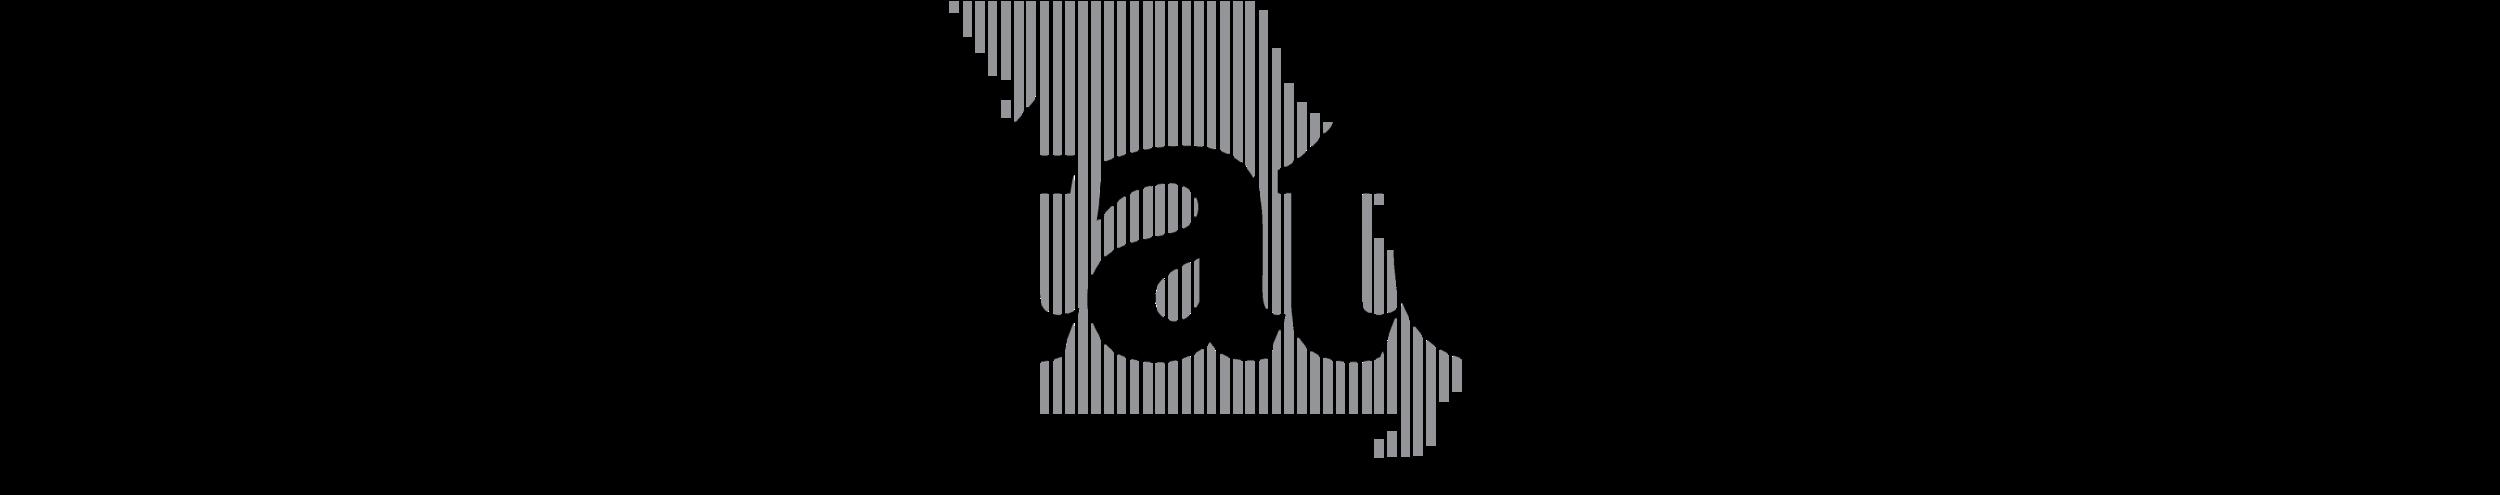 FSB Horizontal logo Black CMYK.png